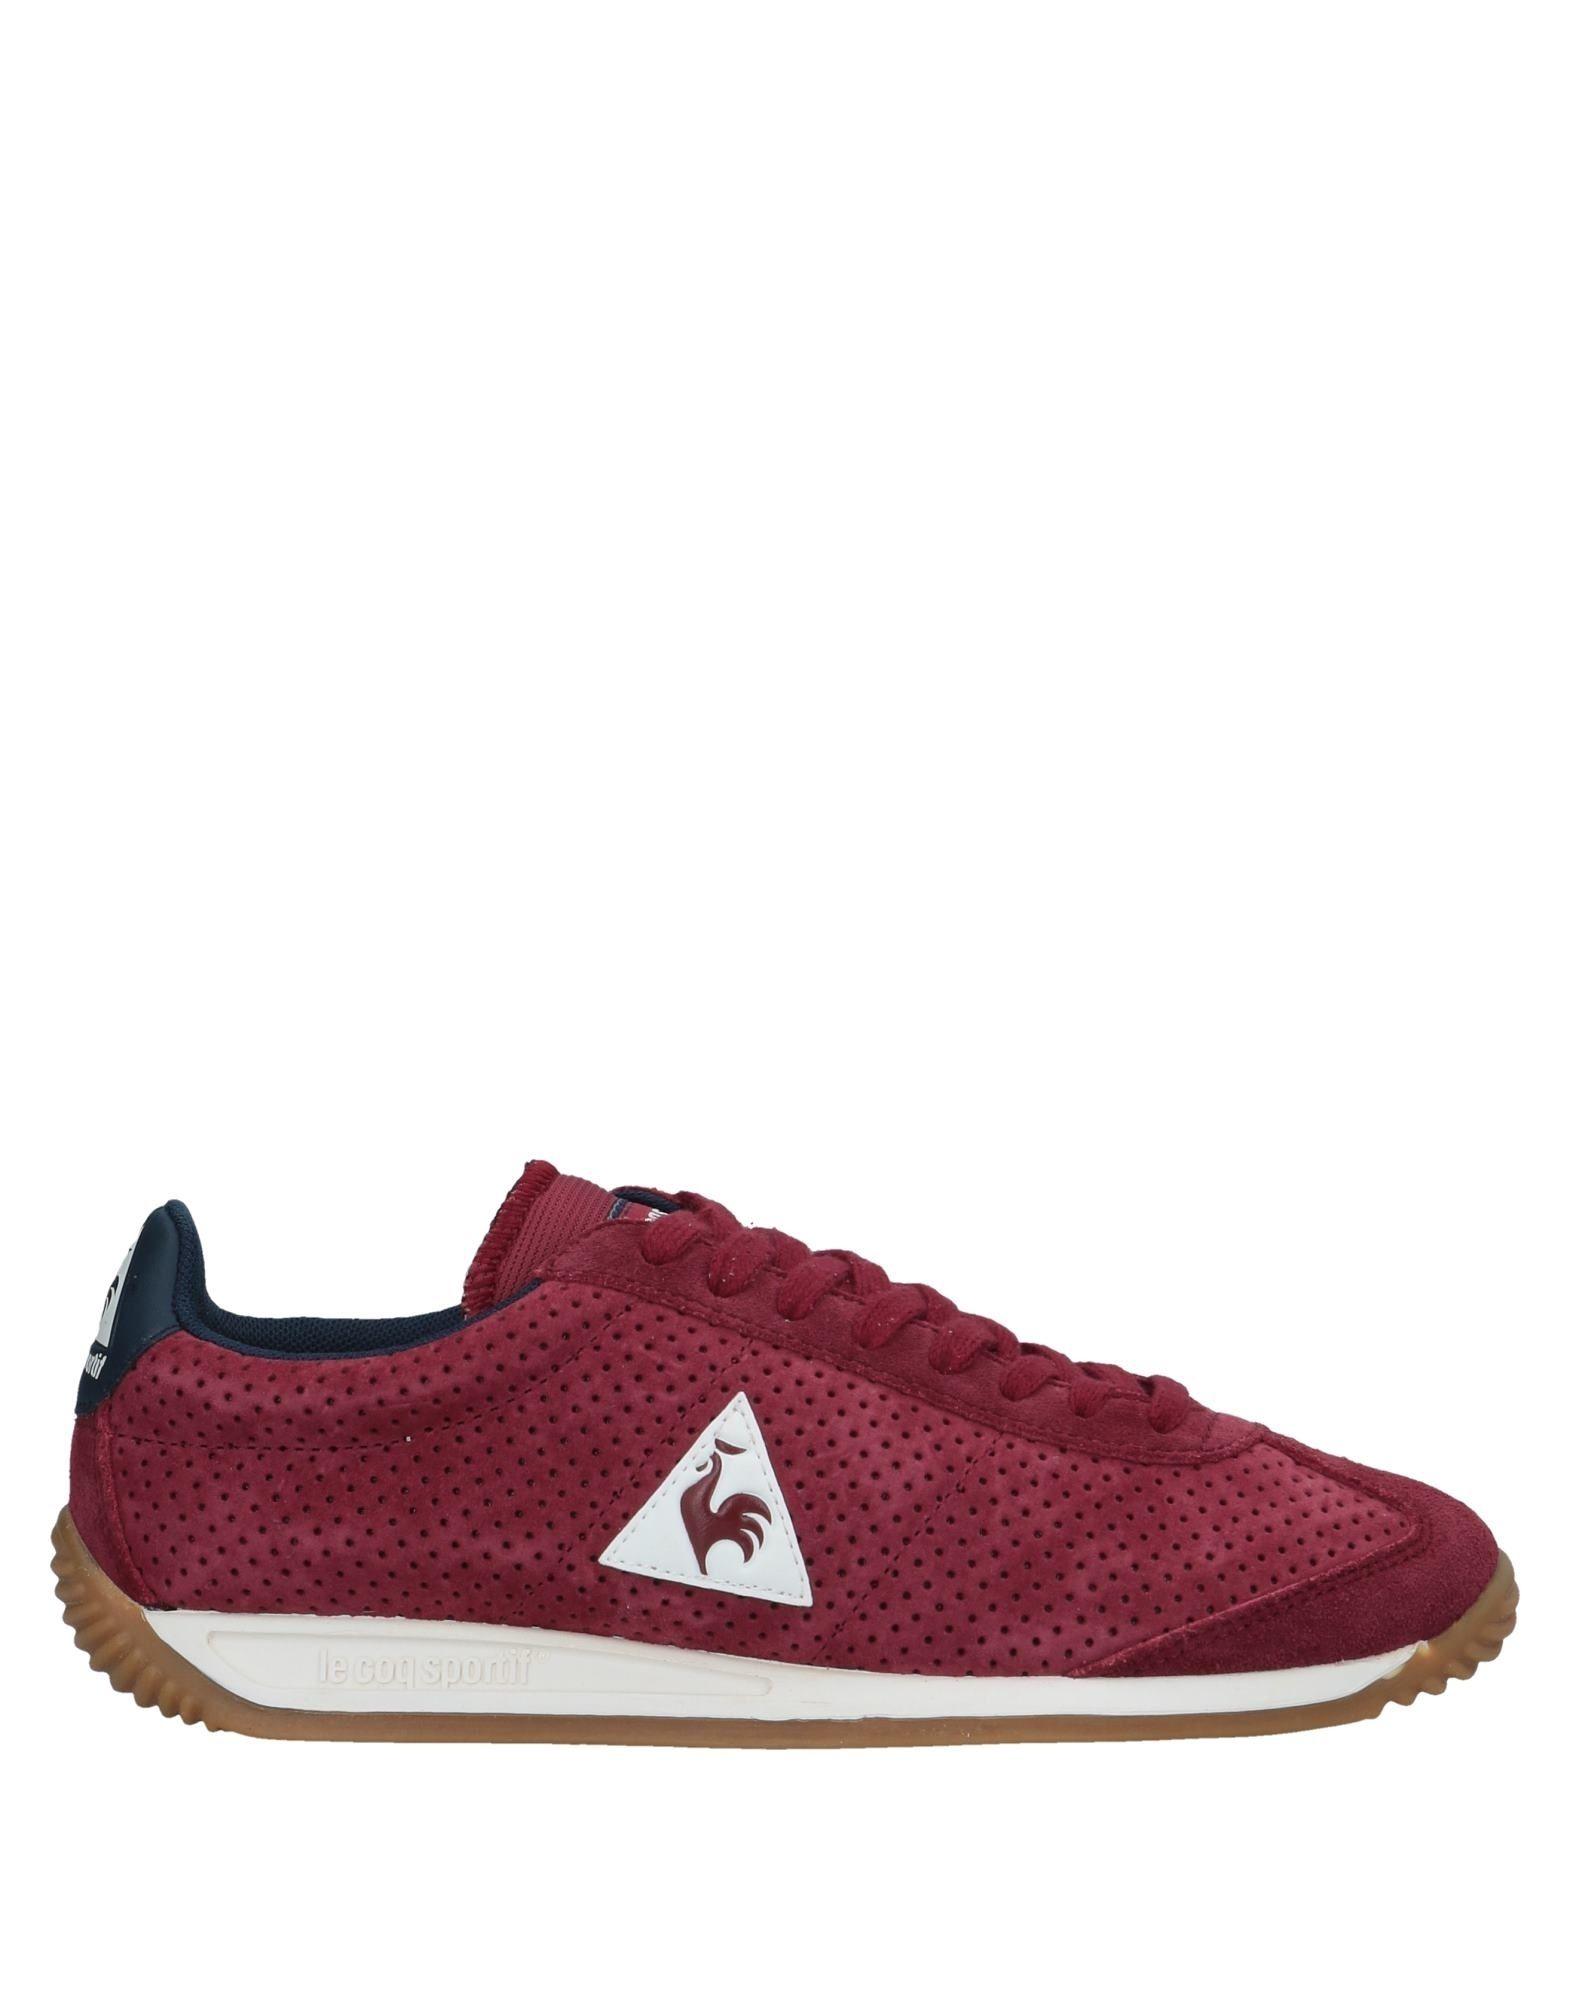 Sneakers Le Coq Sportif Uomo - 11497331KT